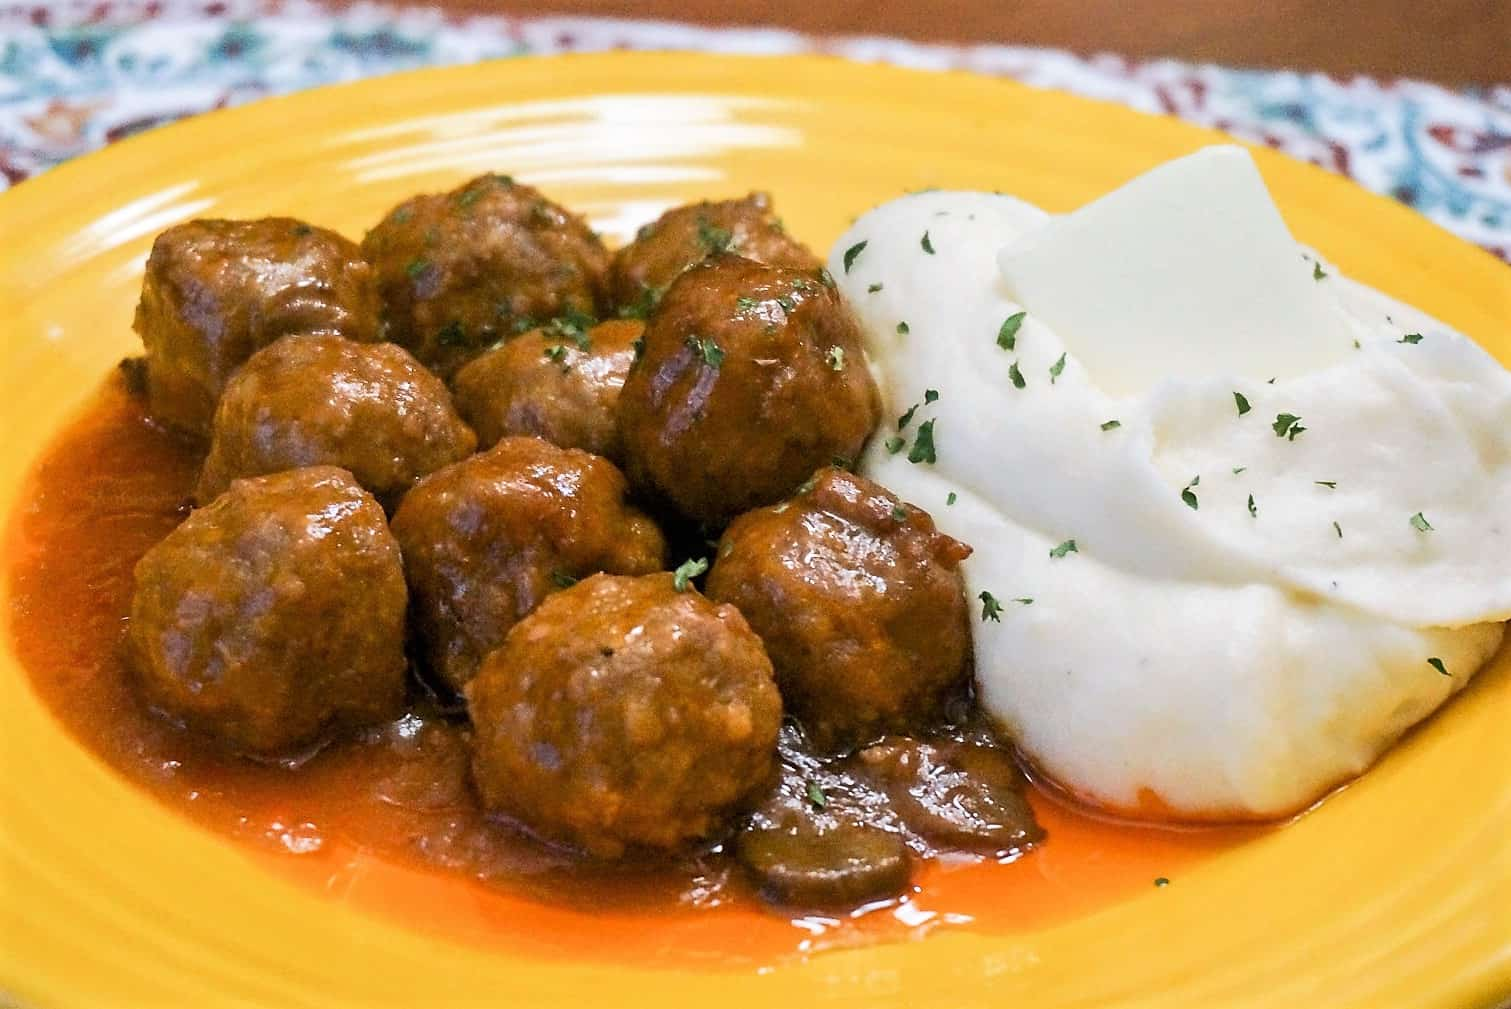 Slow Cooker Mushroom Meatballs